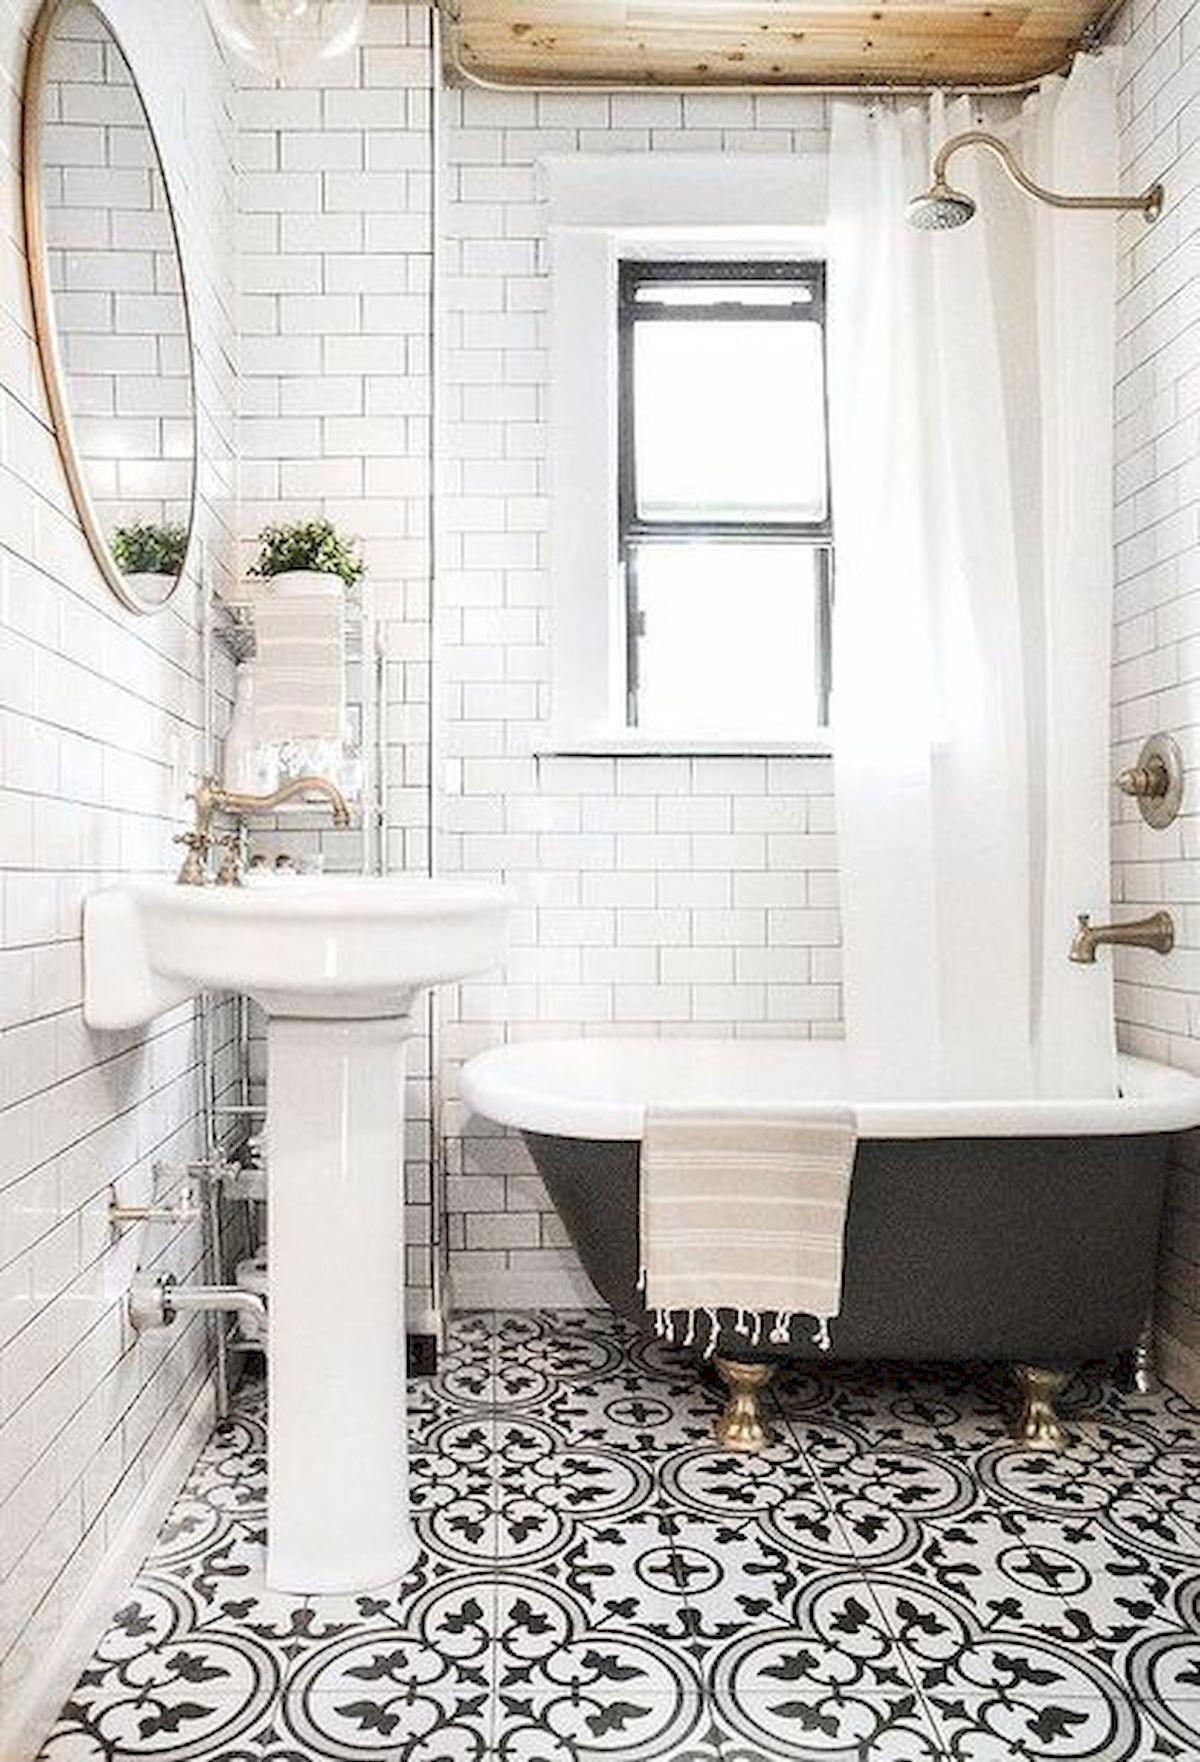 Bathroom Remodel Kansas City Mo Bathroominteriordesignsmallinspiration Bathroomdesignkansascity White Bathroom Bathroom Trends Black White Bathrooms [ jpg ]